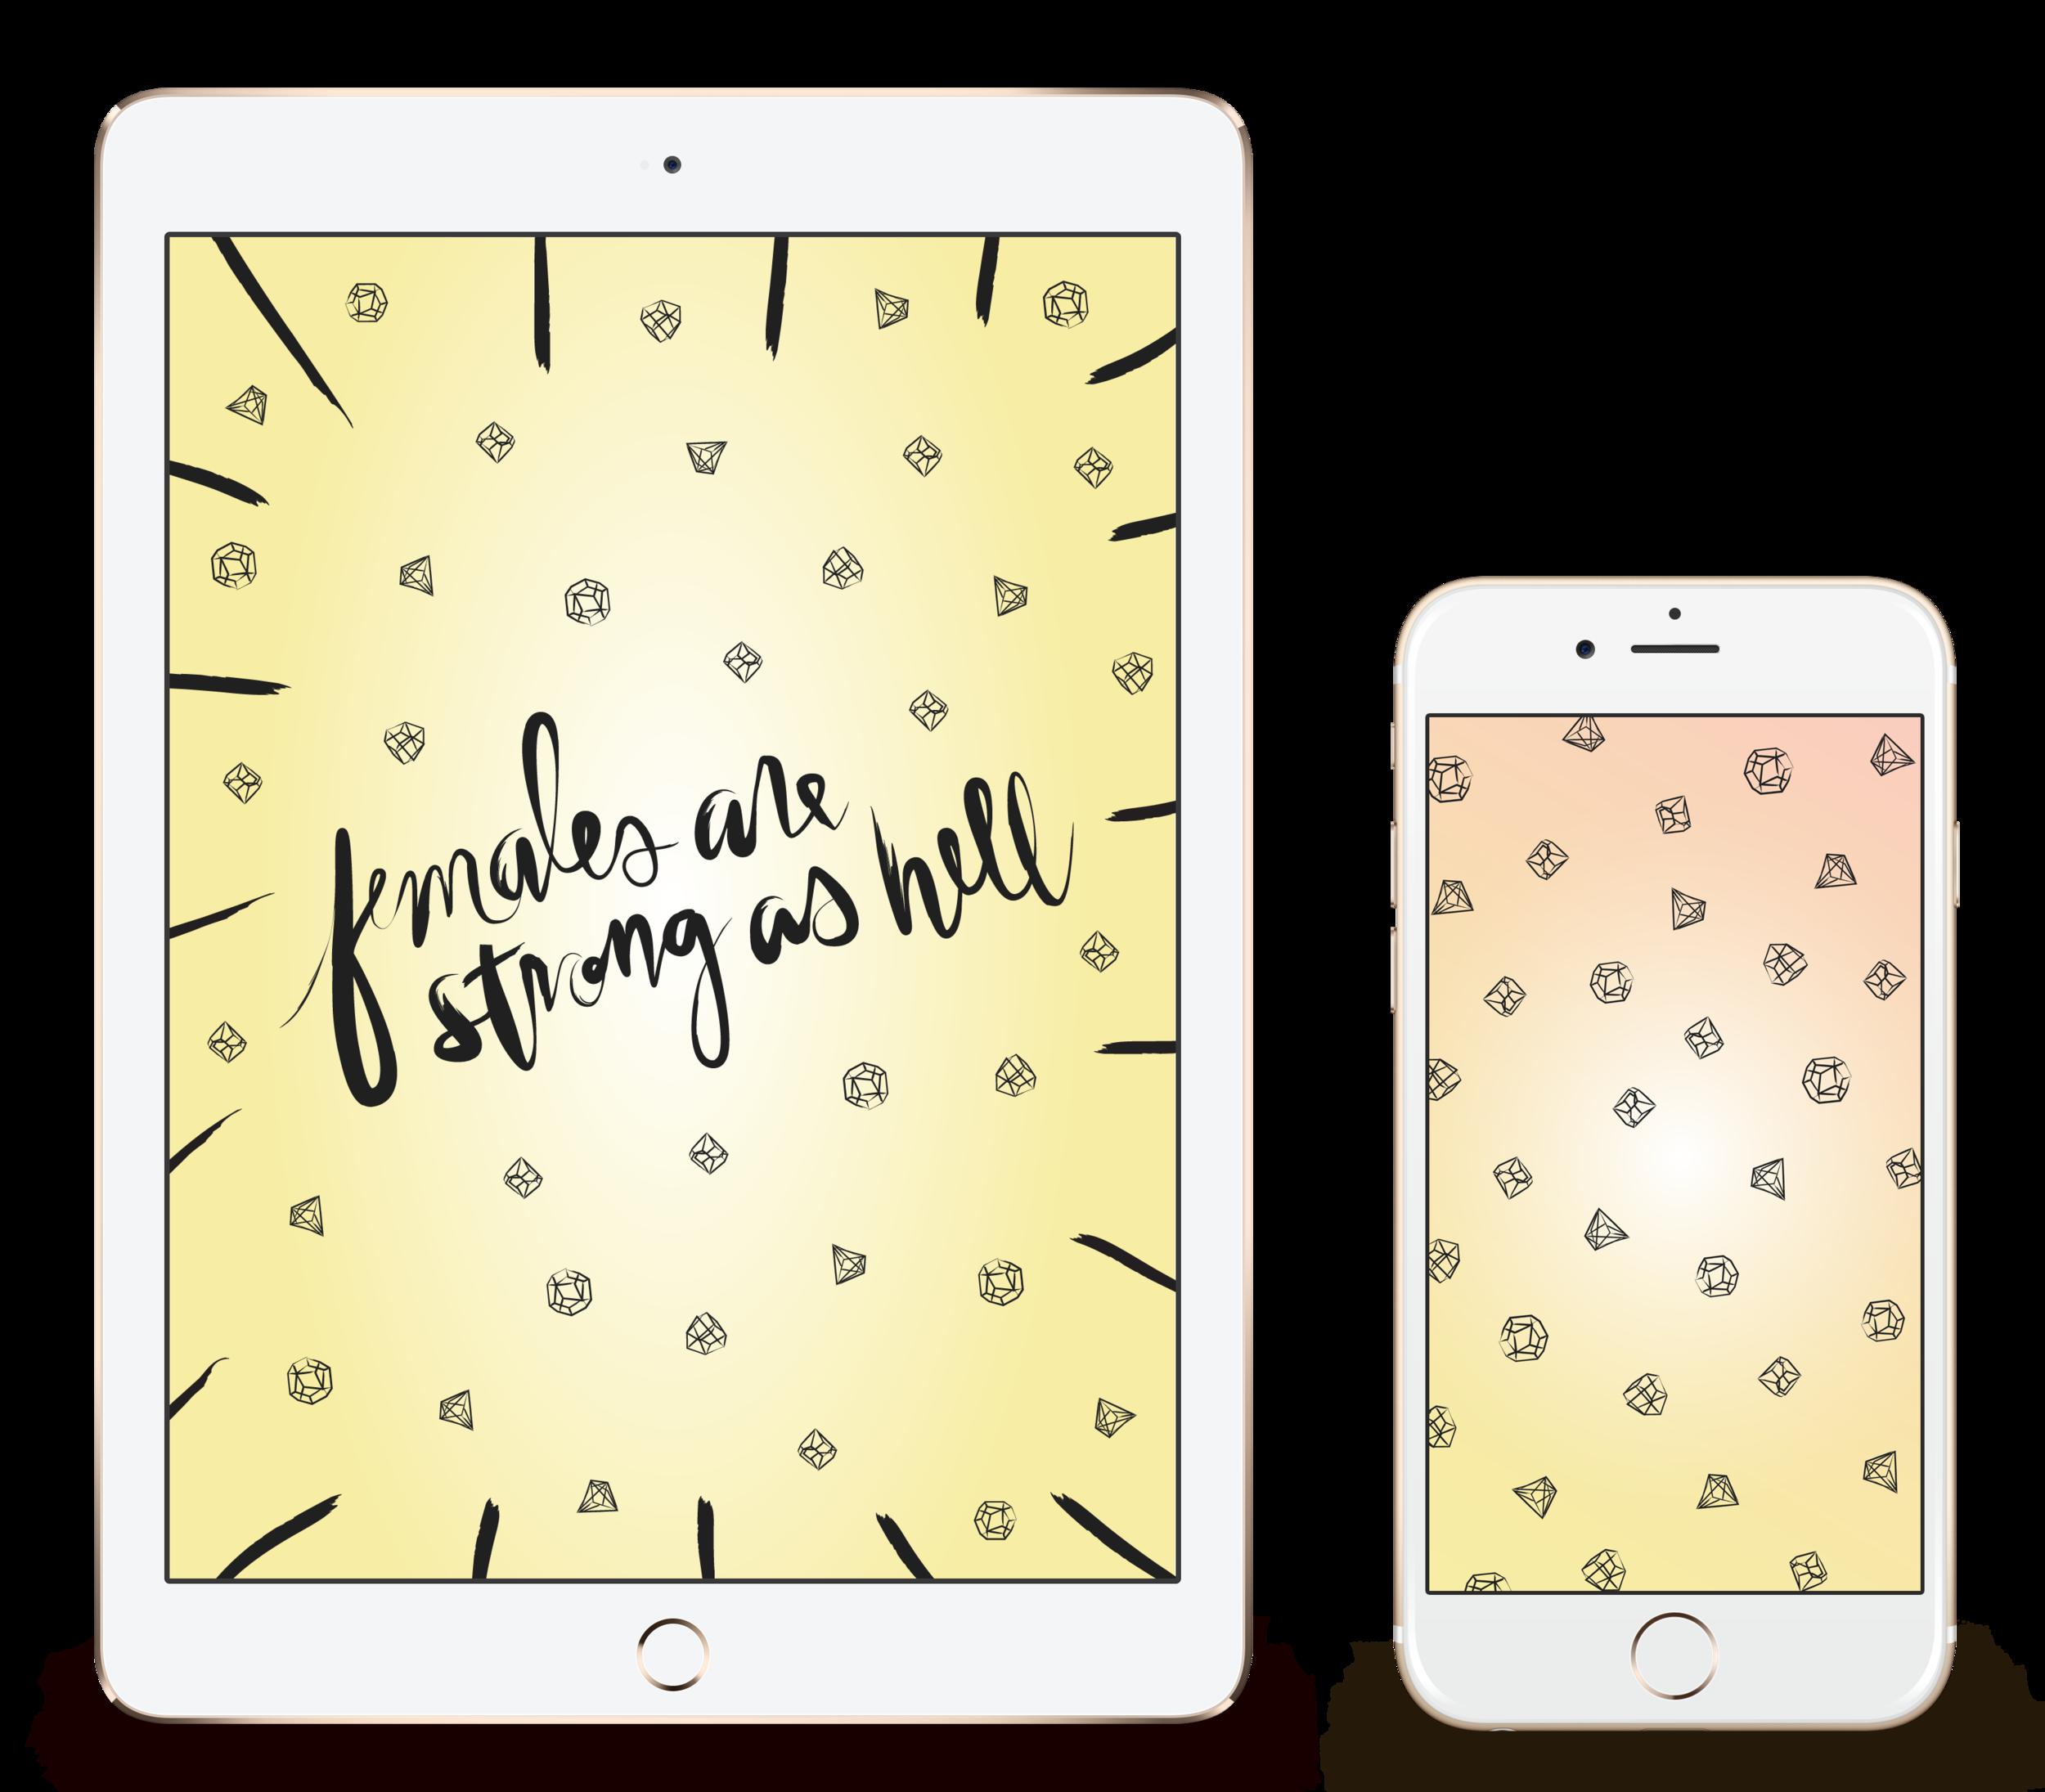 Unbreakable Kimmy Schmidt wallpaper downloads | Freckle & Fair